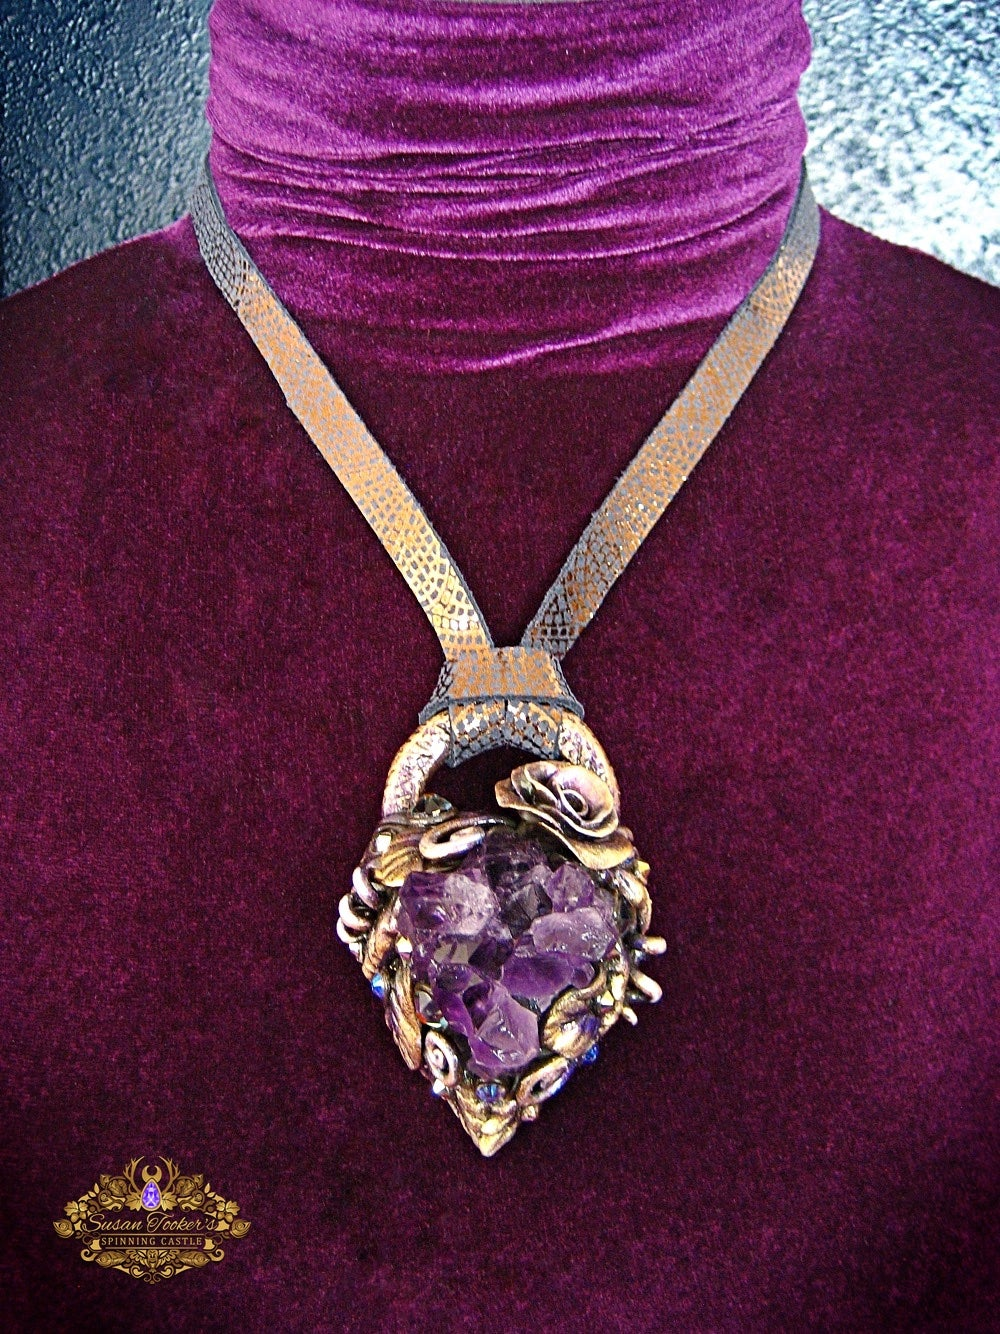 Image of PURPLE PIXIE - Amethyst Quartz Cluster Statement Amulet Necklace Witch Aesthetic